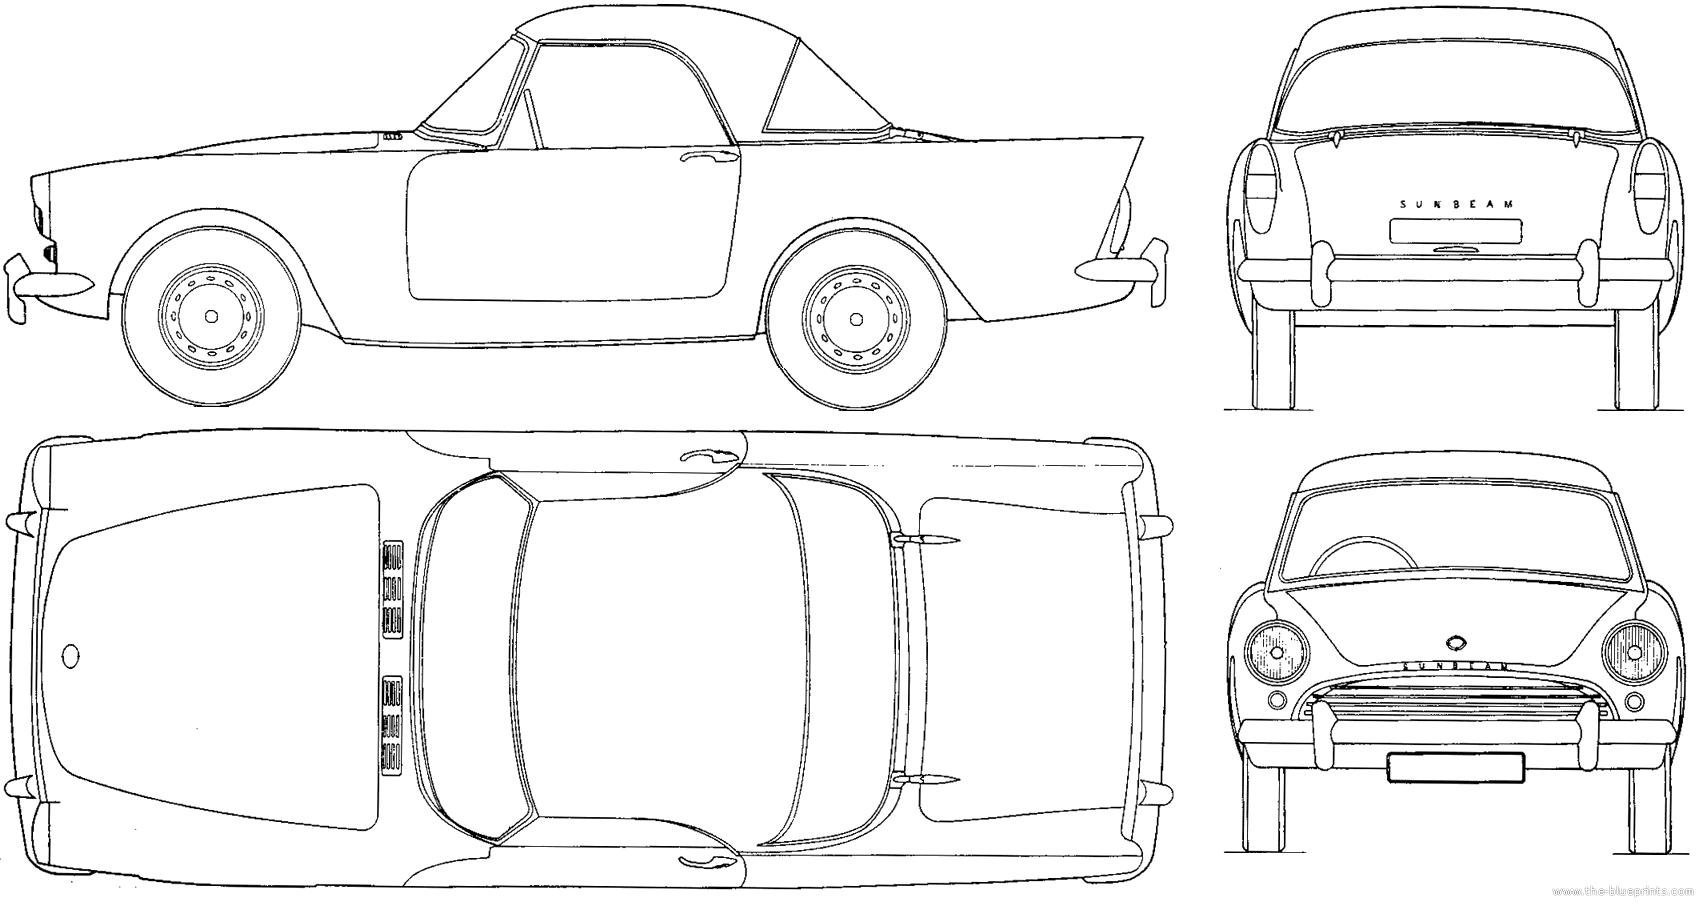 Blueprints > Cars > Sunbeam > Sunbeam Alpine Mk.II (1961)